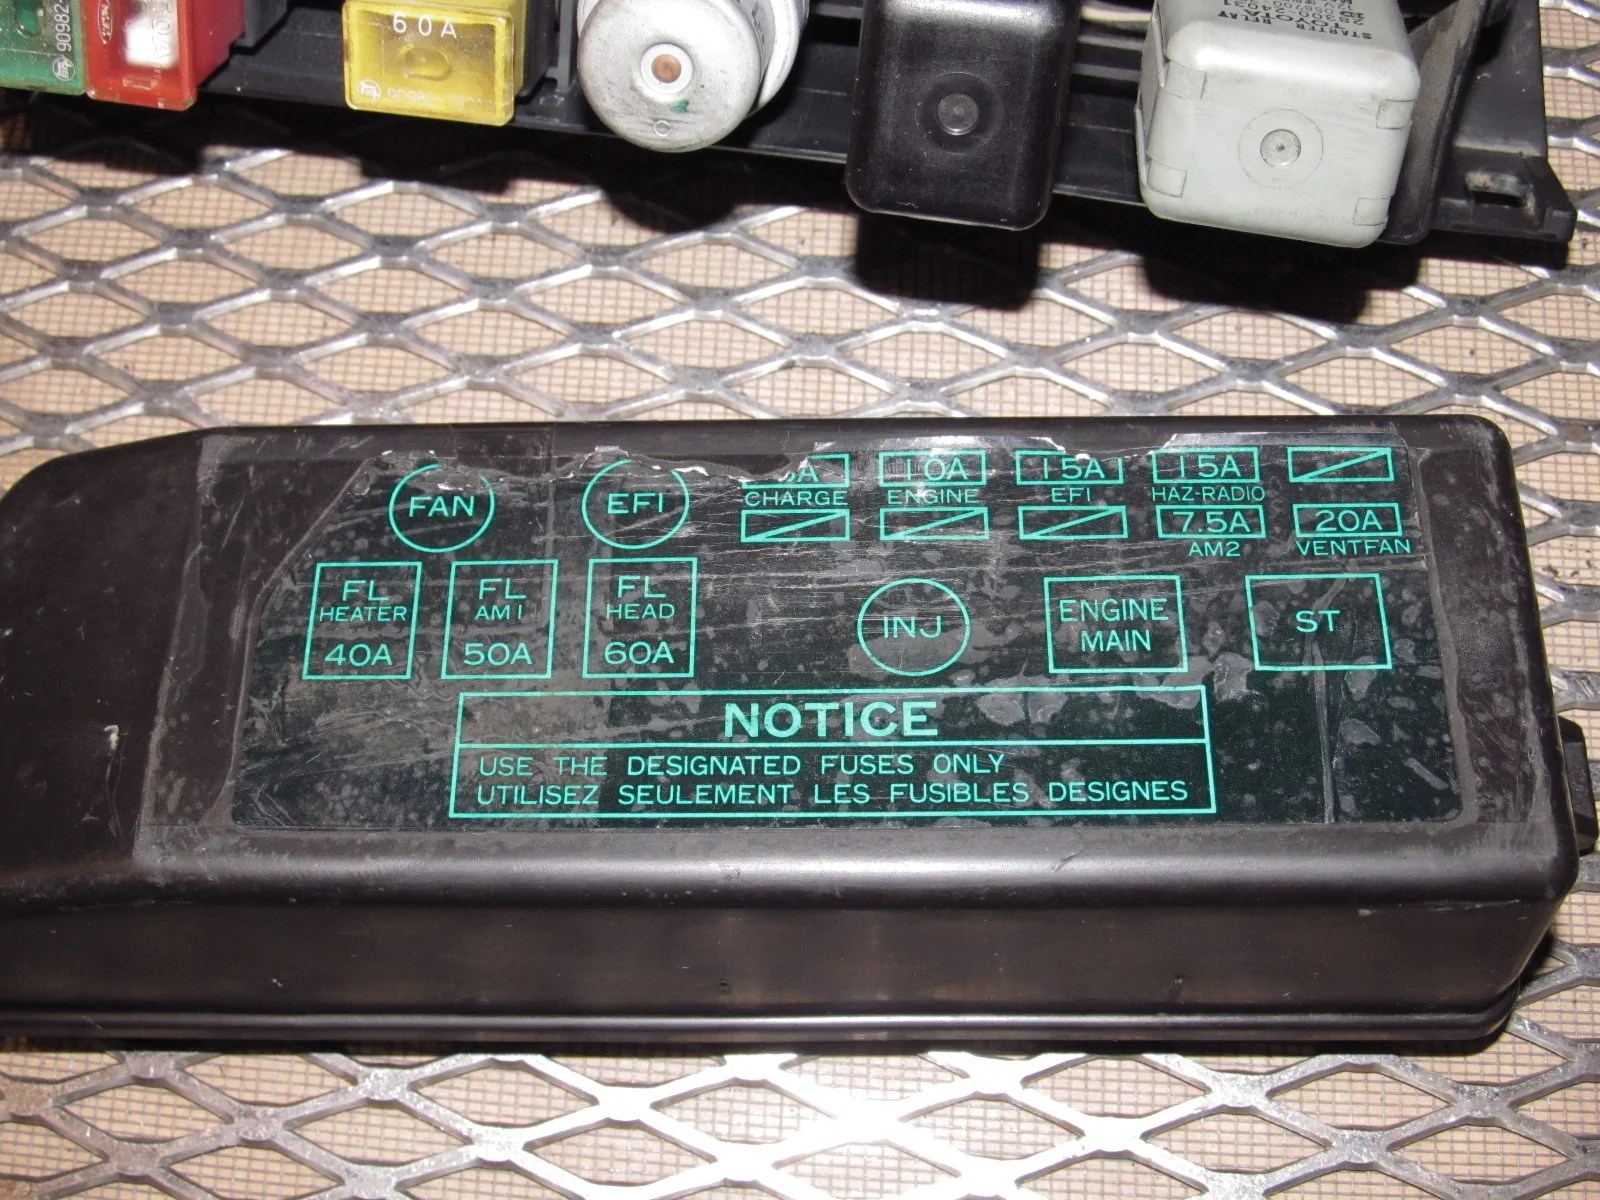 hight resolution of 1987 toyota mr2 fuse box diagram wiring diagram advance 1991 toyota mr2 fuse box diagram aw11 mr2 fuse box diagram